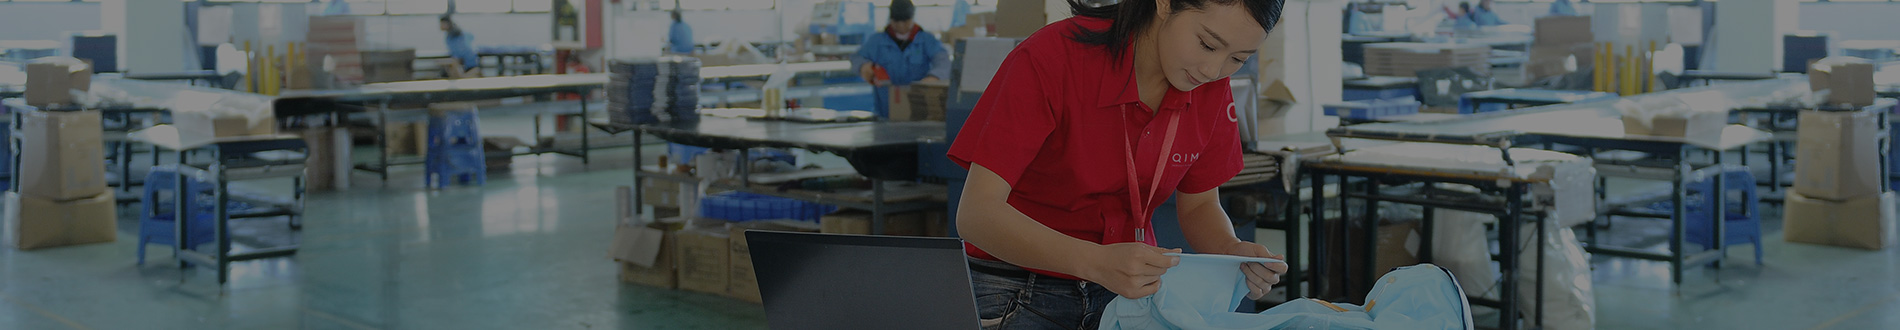 Garment & Apparel Quality Control Testing   QIMA